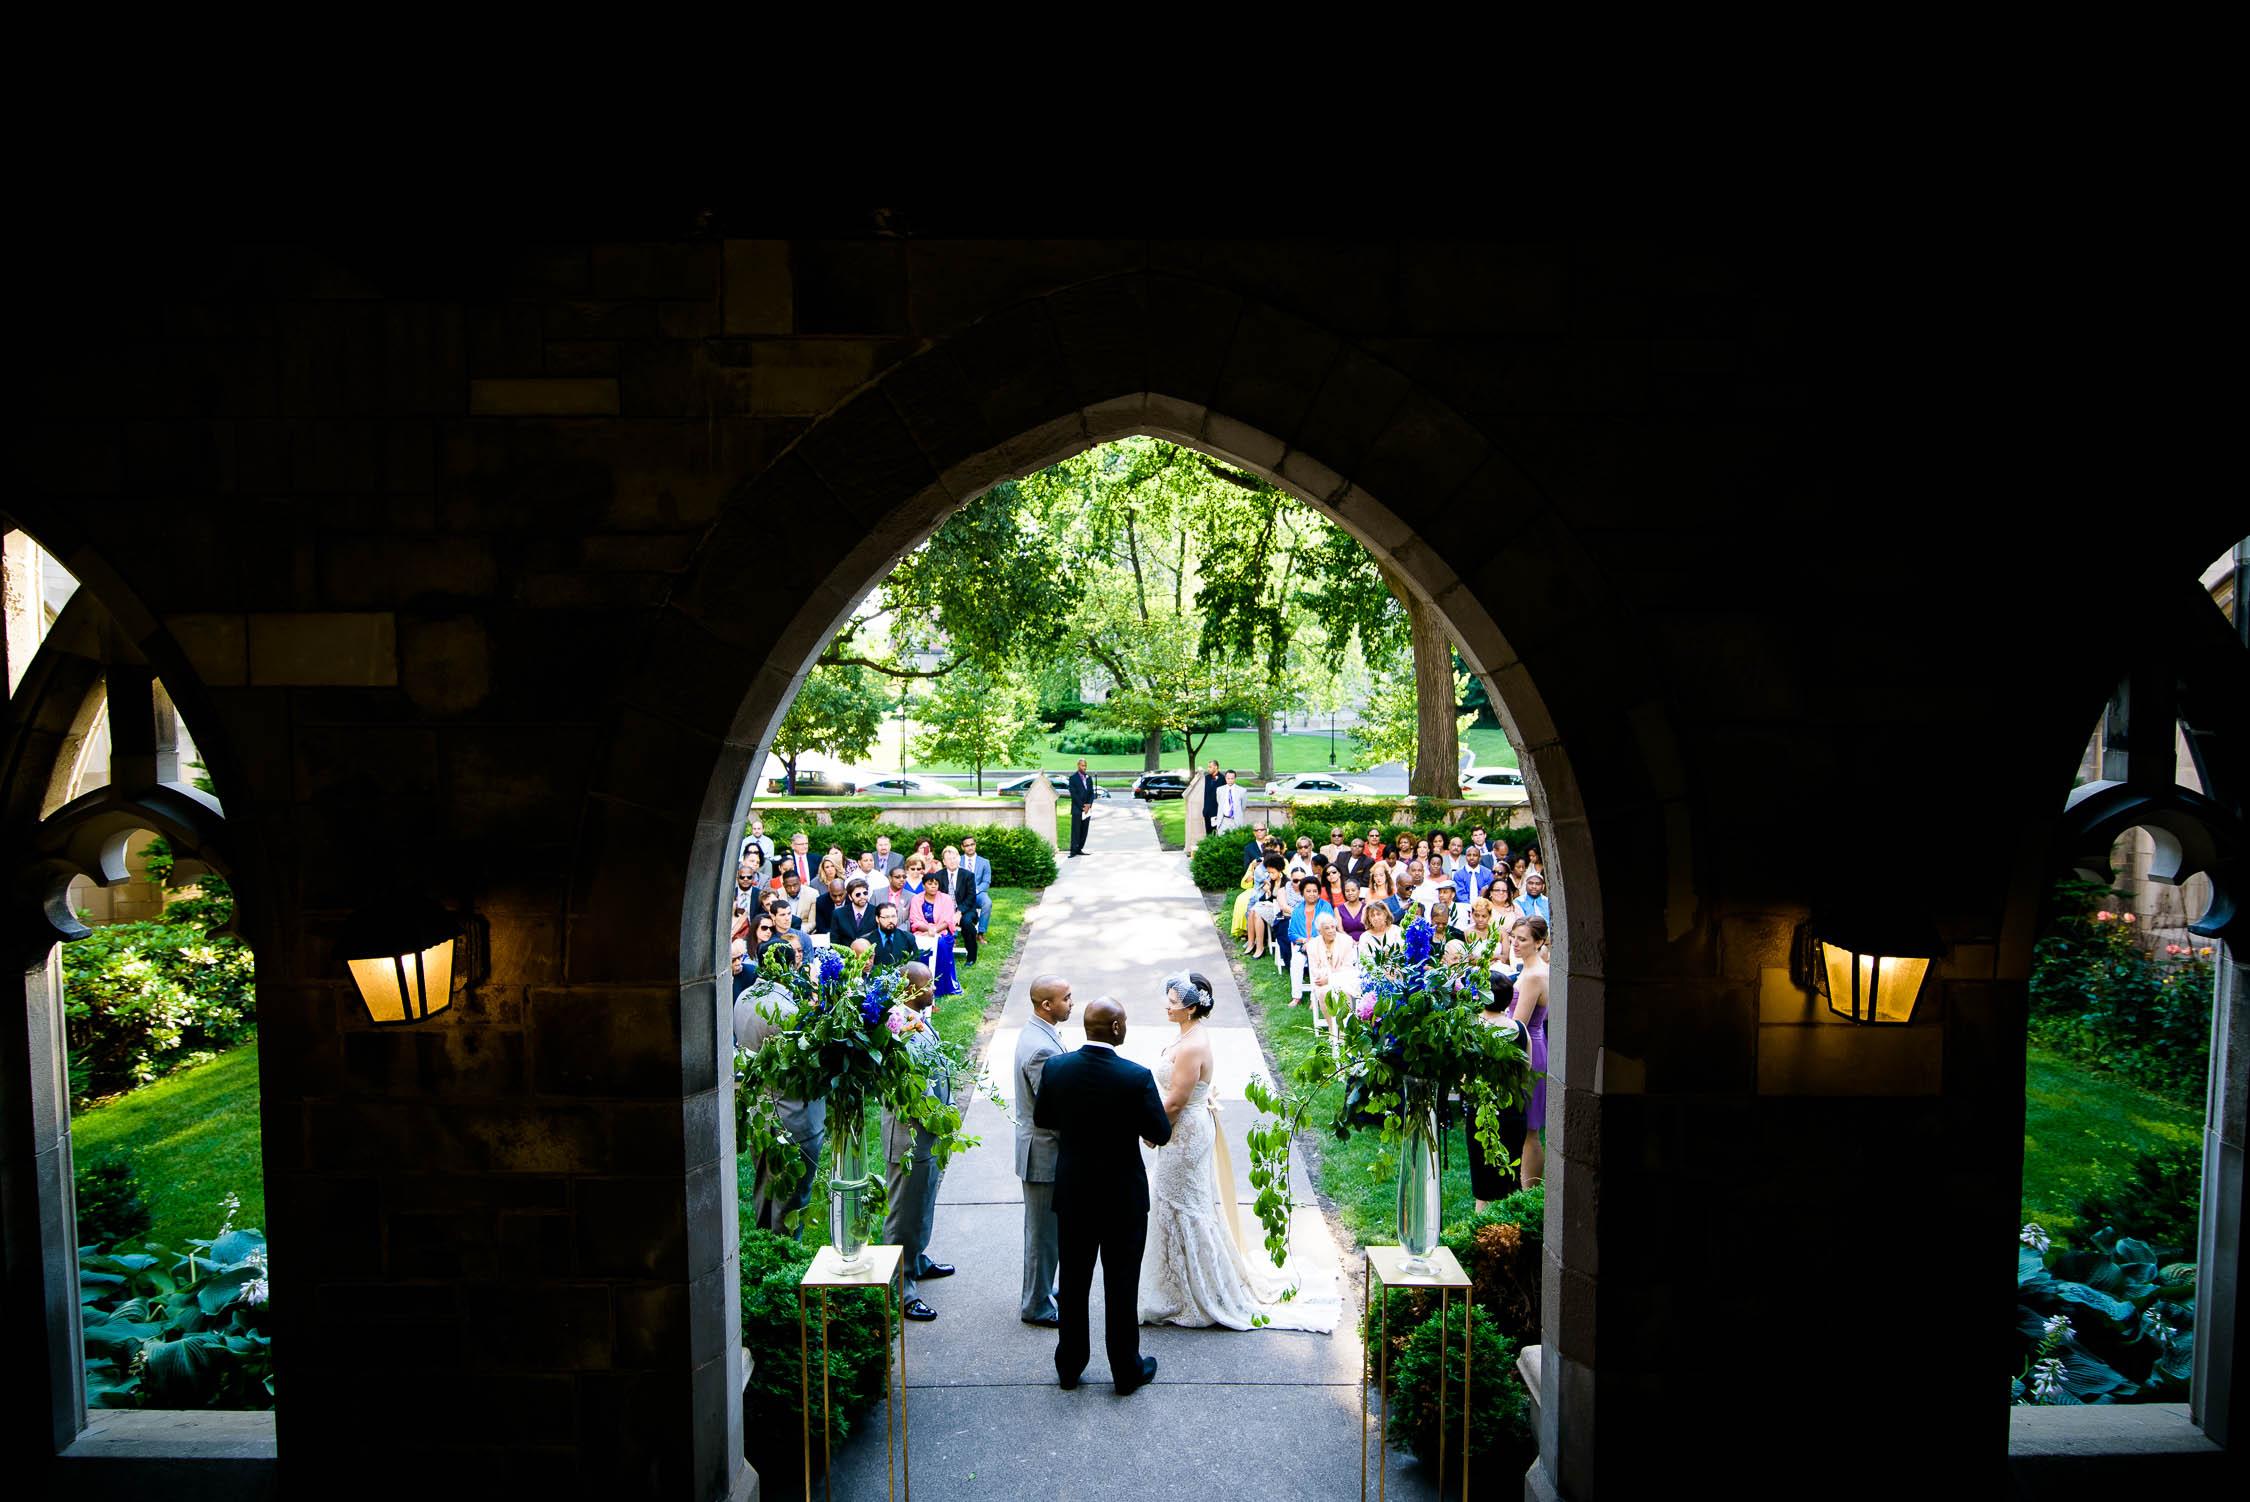 Wedding ceremony held outside Ida Noyes Hall at the University of Chicago.